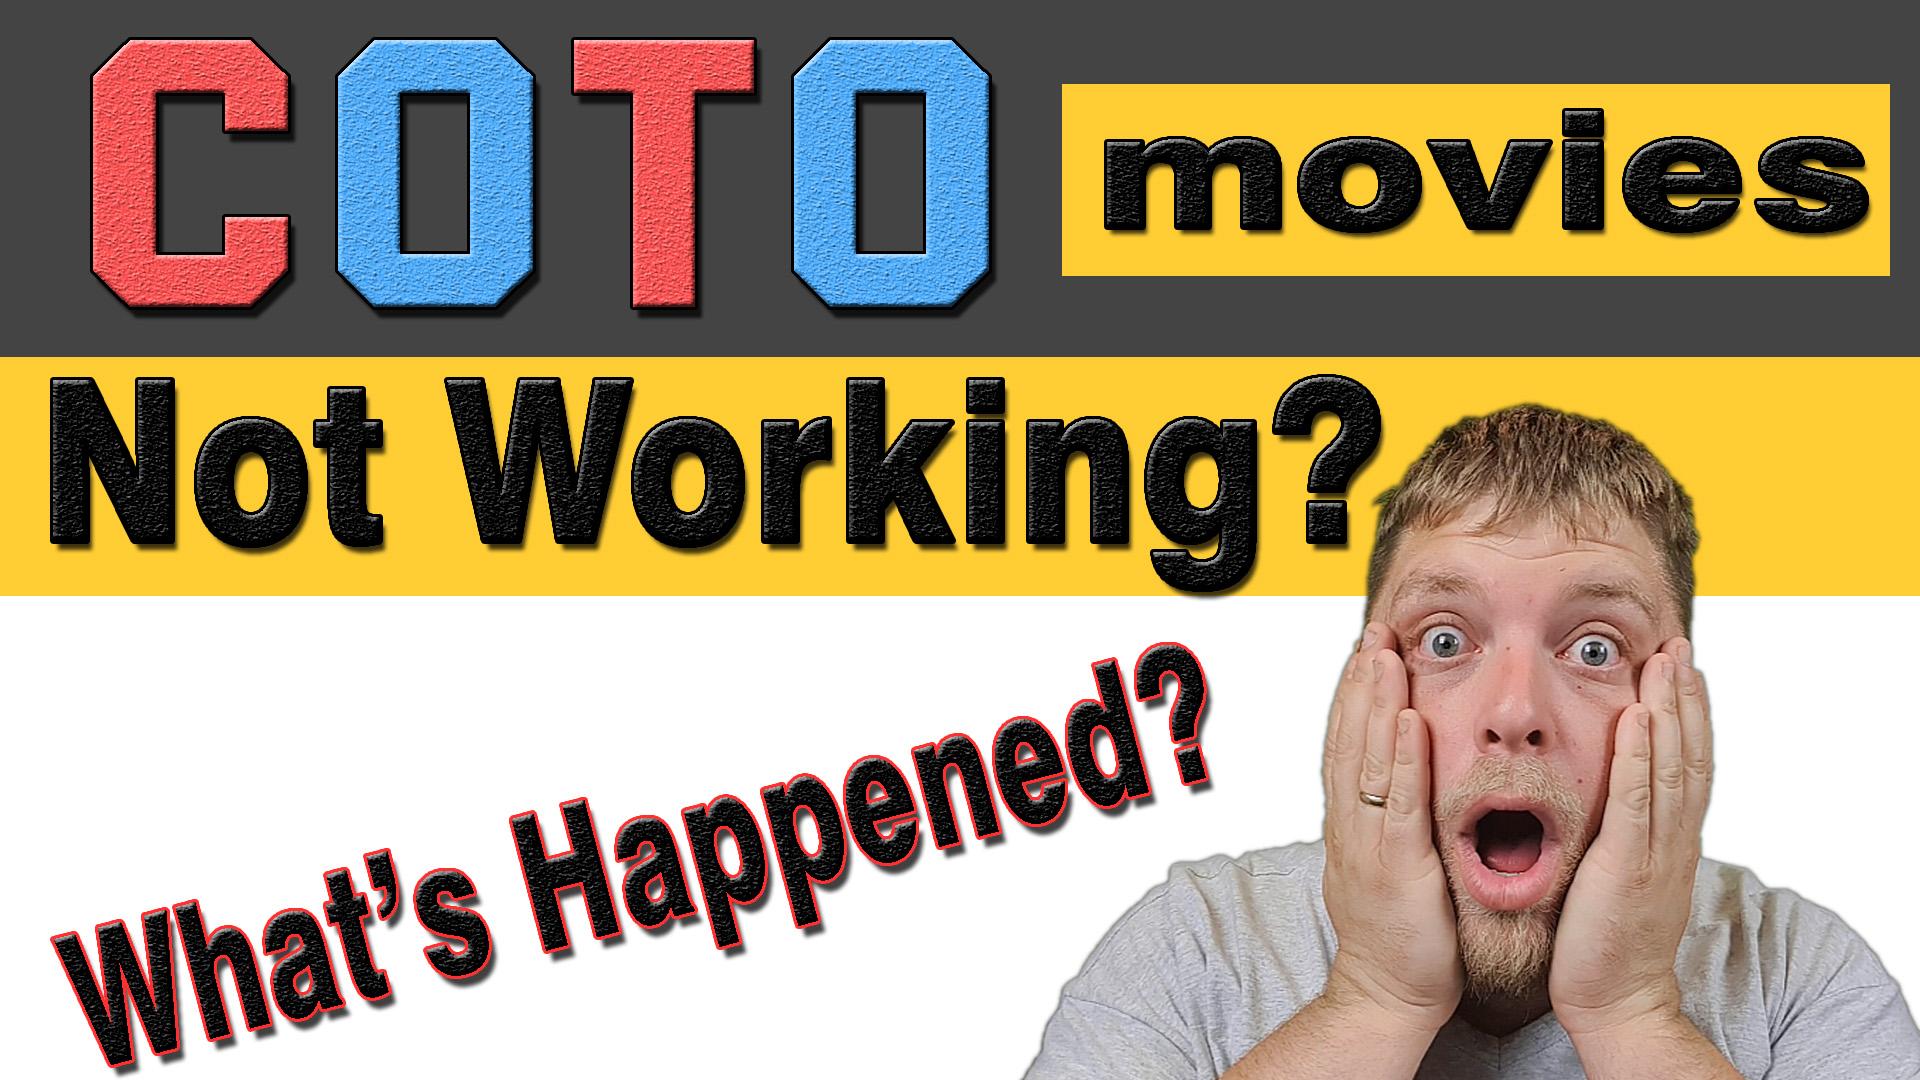 coto movies won't open